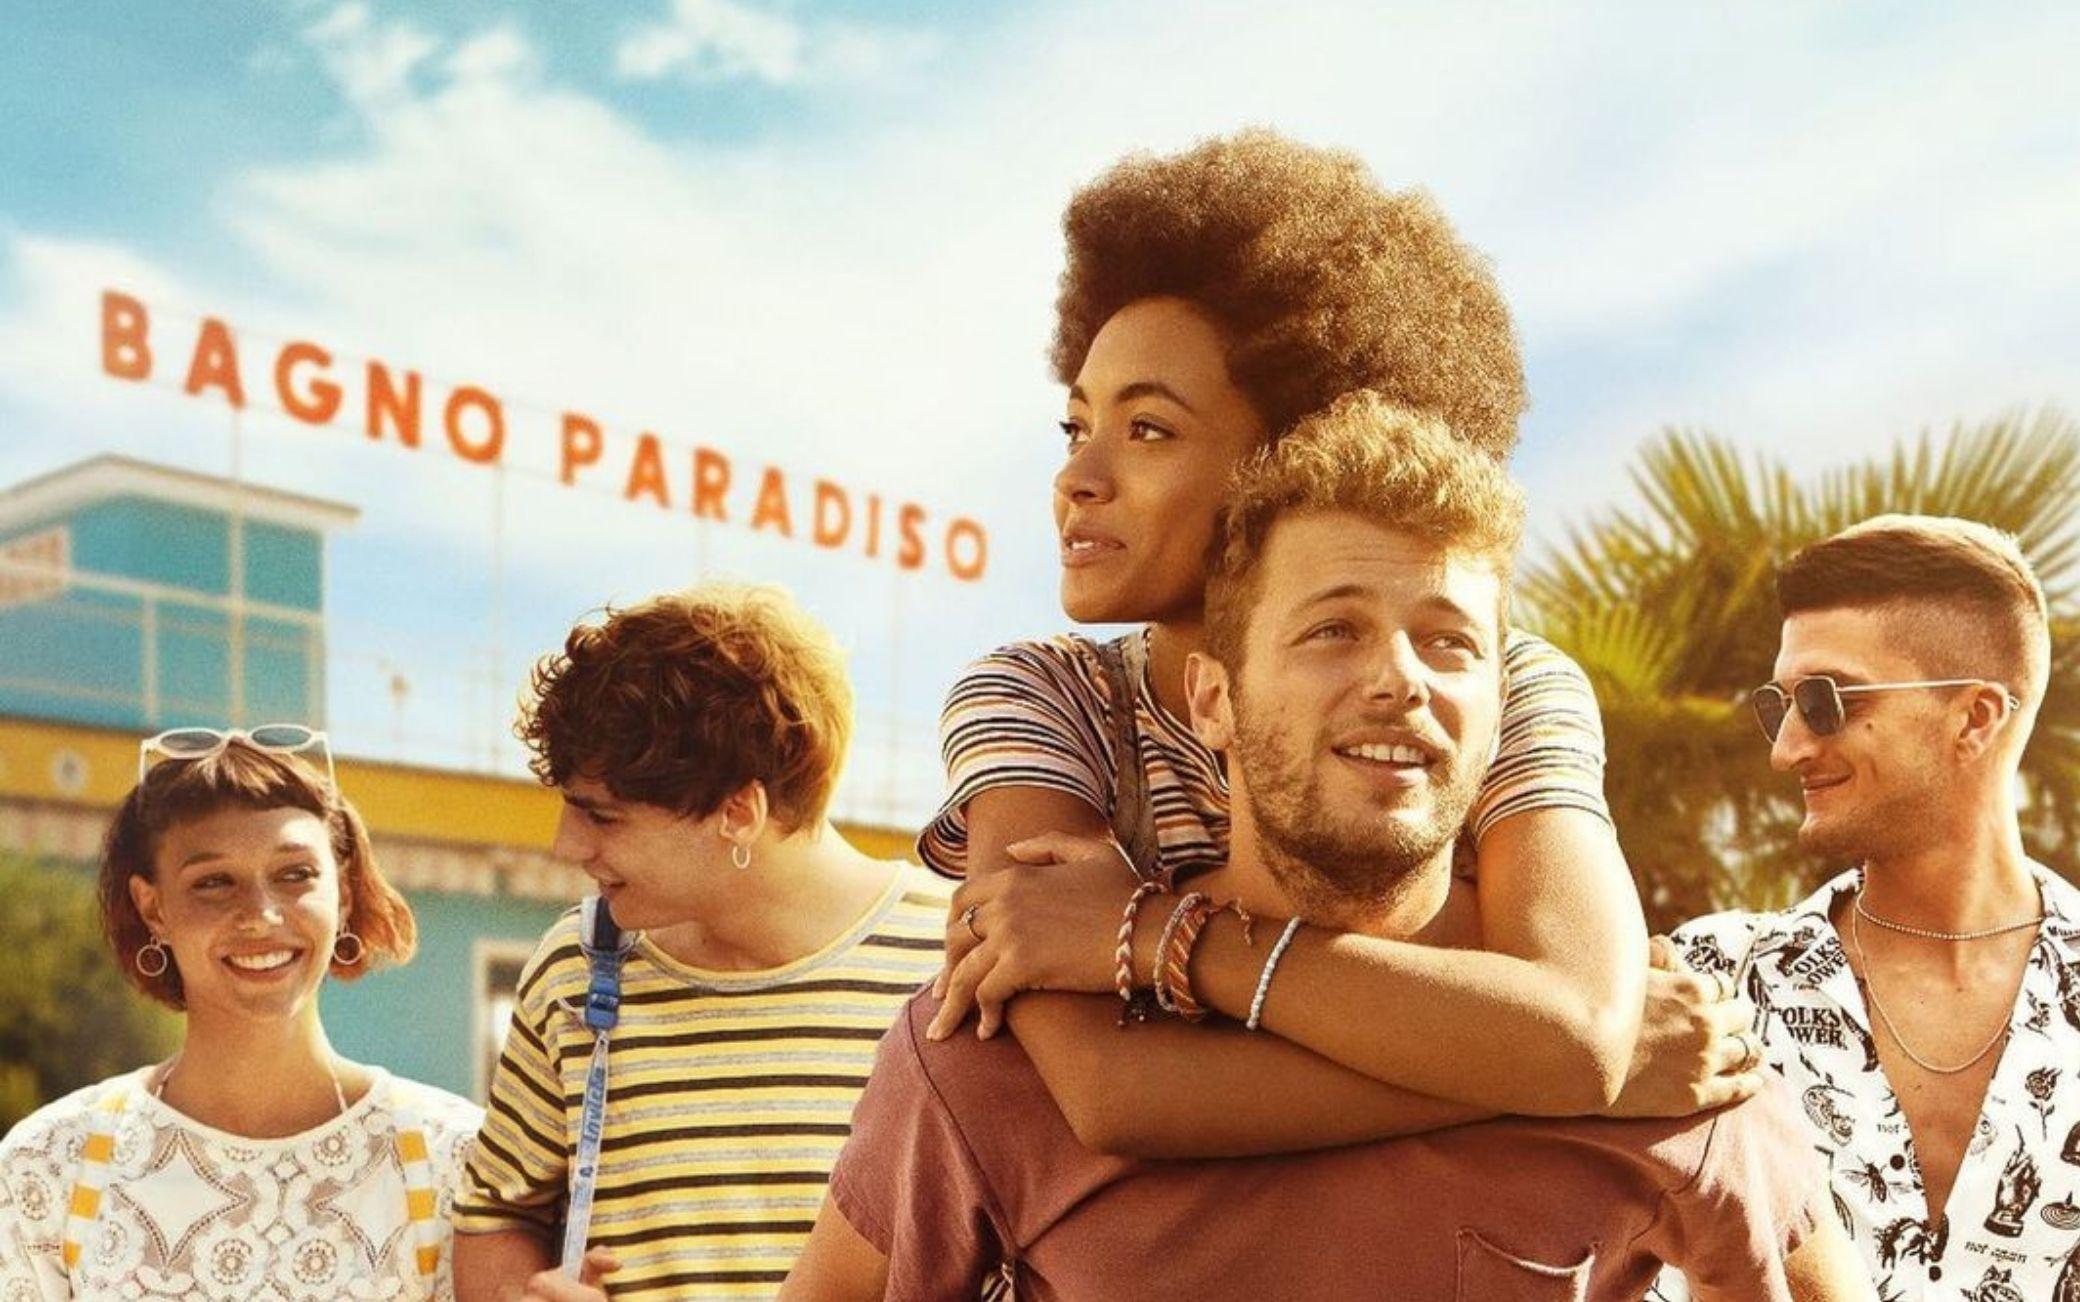 Summertime 2, a trailer for the Netflix series